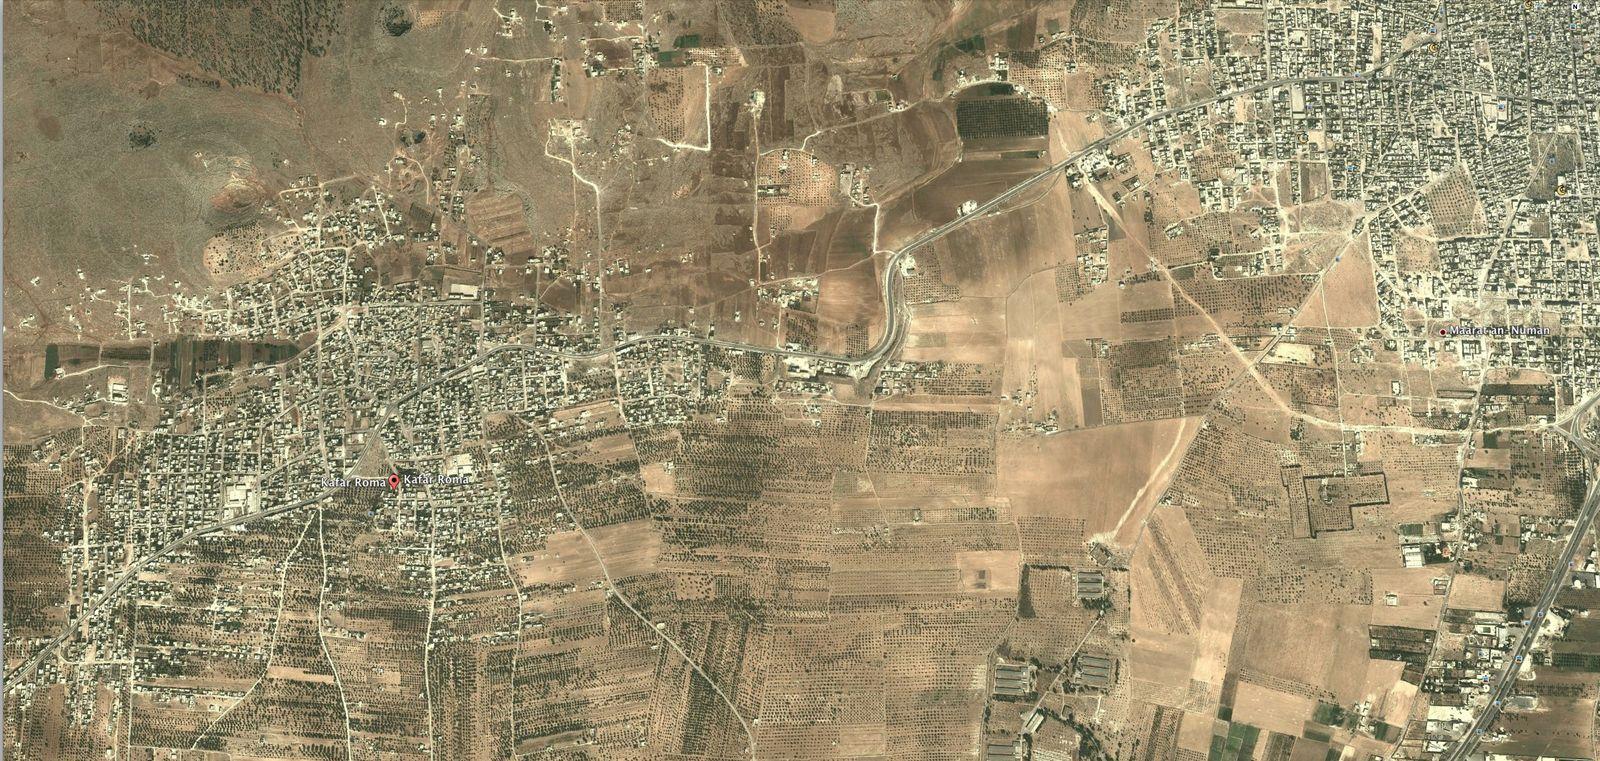 EINMALIGE VERWENDUNG SCREENSHOT/ Kafar Roma/ Syrien